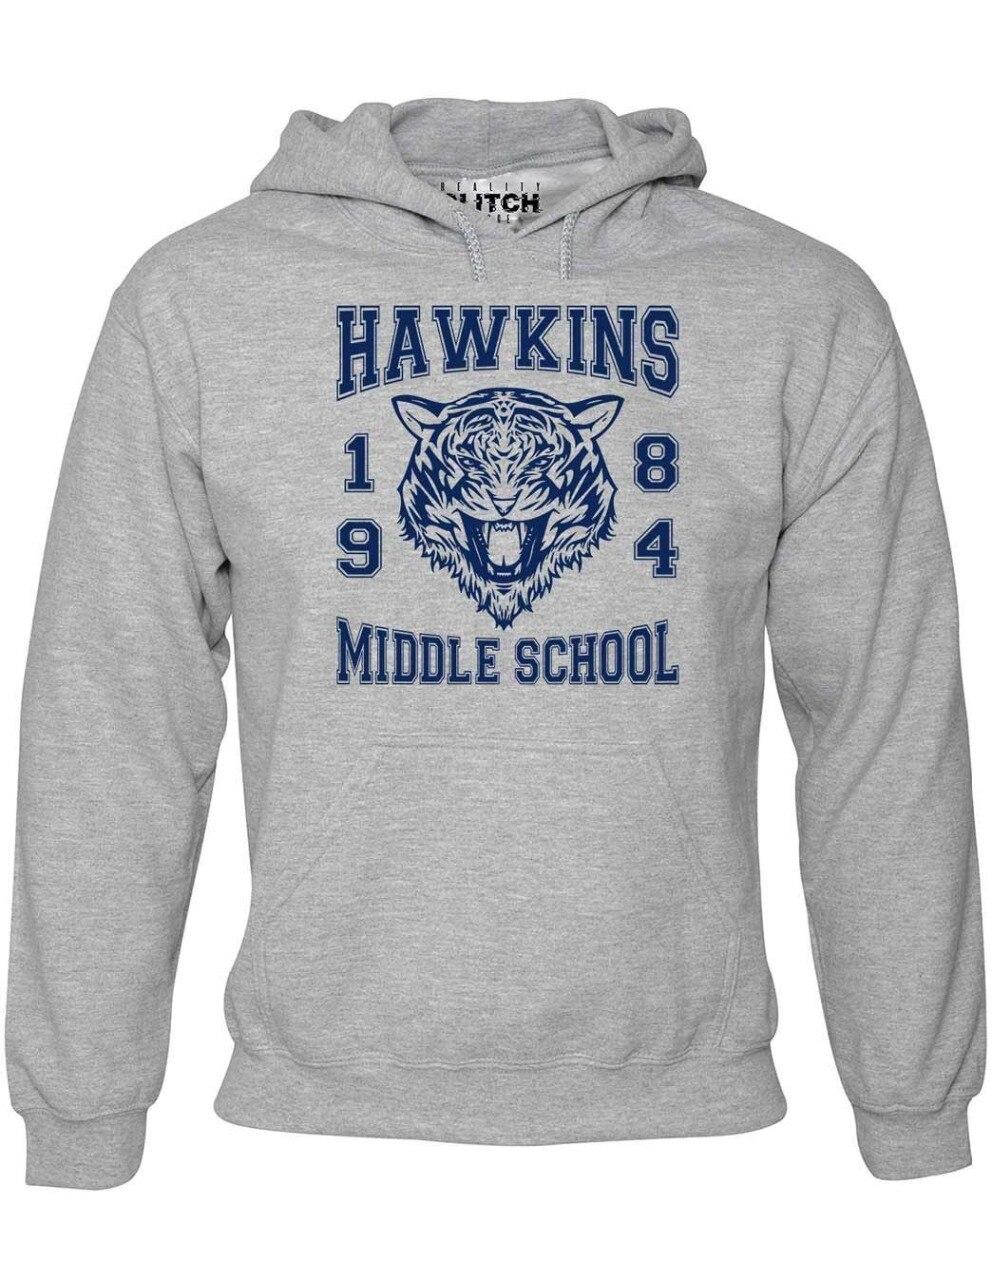 2019 fashion man Hoodie Mens Hawkins Middle School - Stranger Will Sci-Fi Upside Down TV Sweatshirt